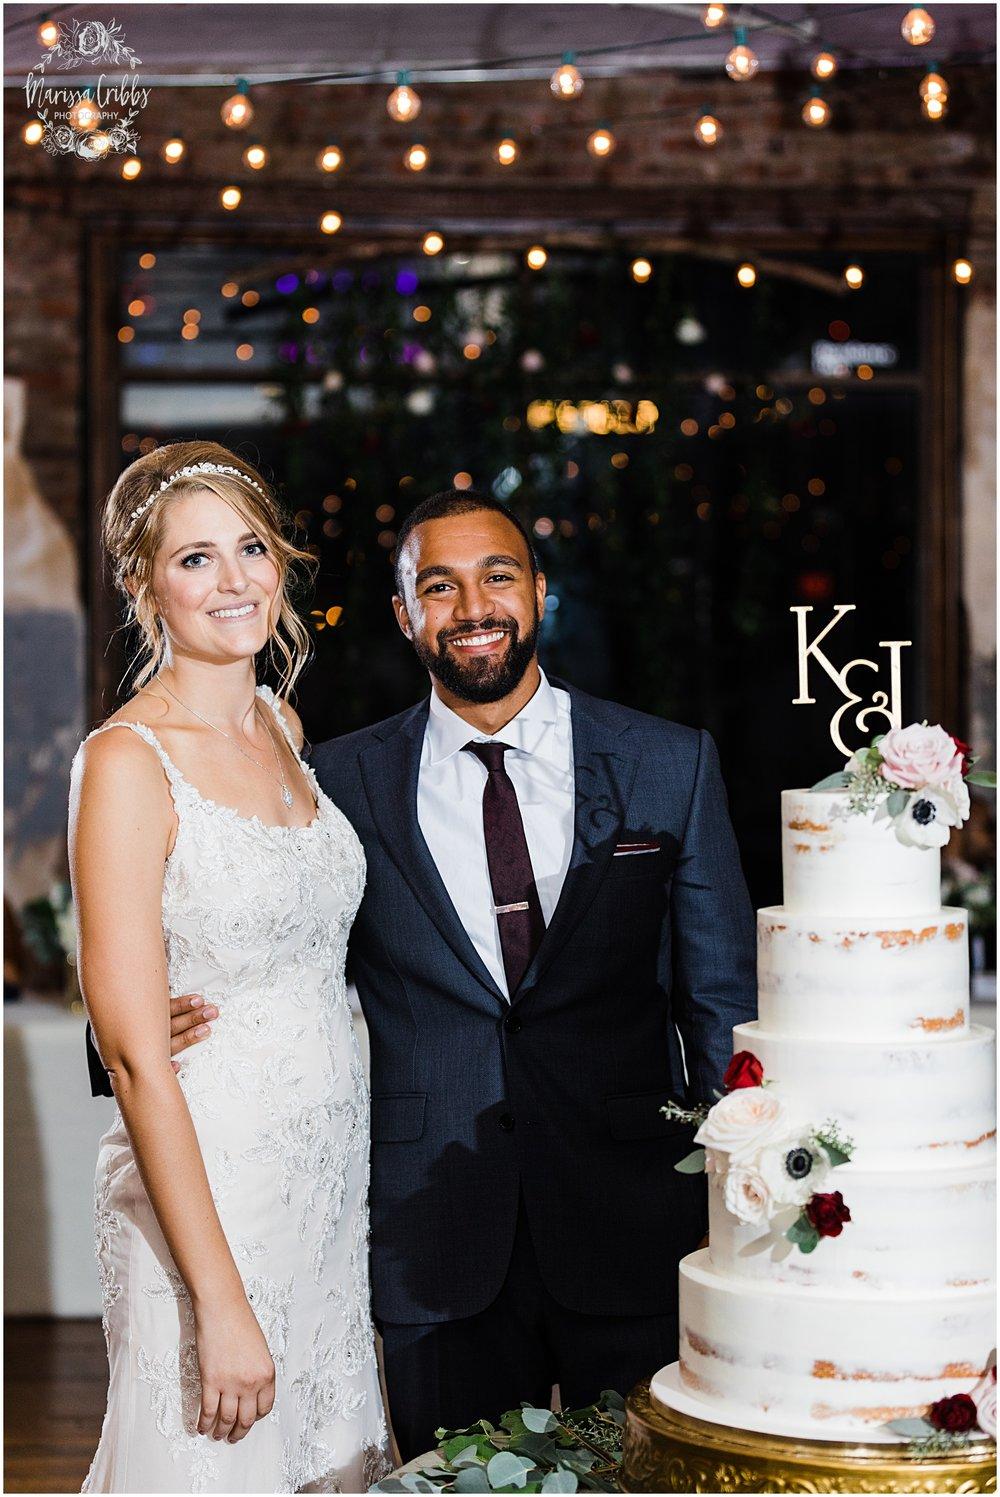 BAUER WEDDING | KELSEA & JUSTIN | MARISSA CRIBBS PHOTOGRAPHY_6585.jpg